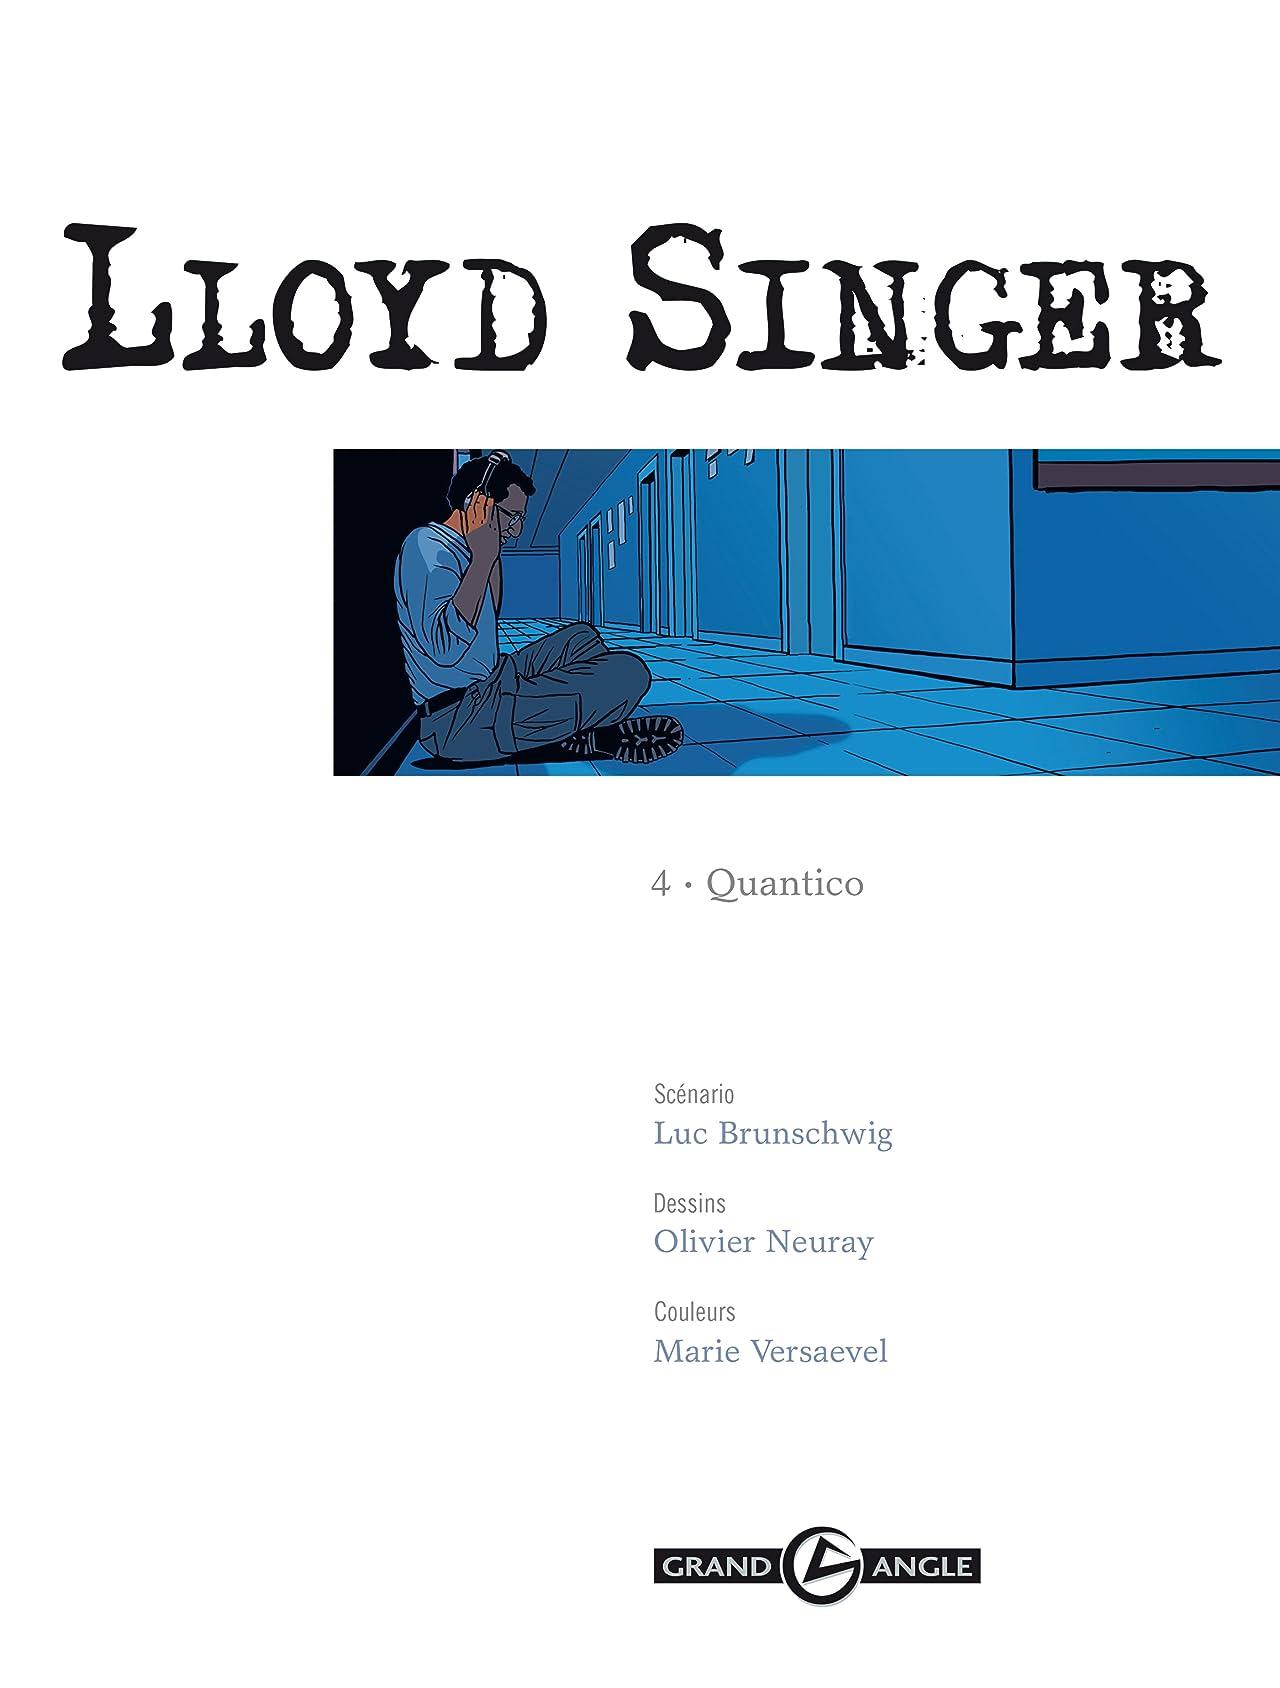 Lloyd Singer Vol. 4: Quantico